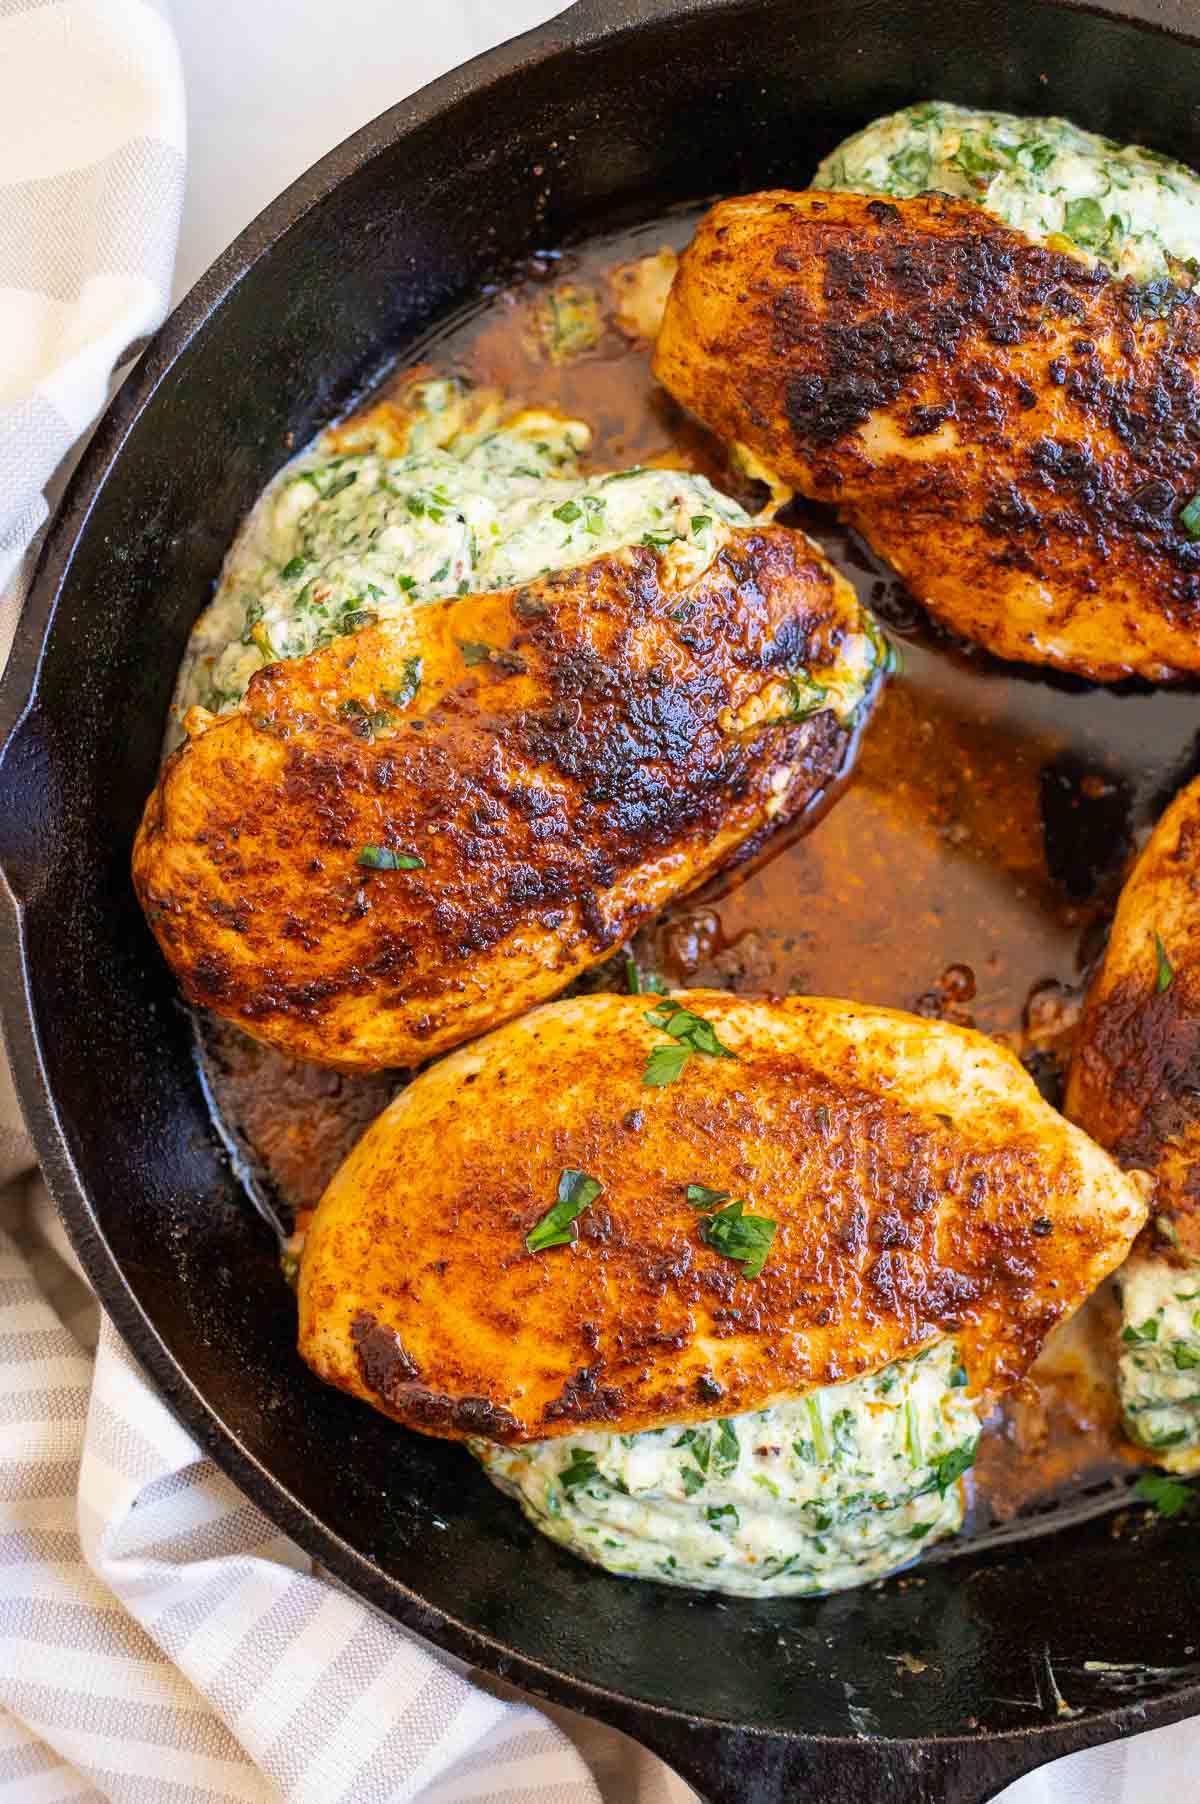 spinach stuffed chicken breast in white skillet with gravy